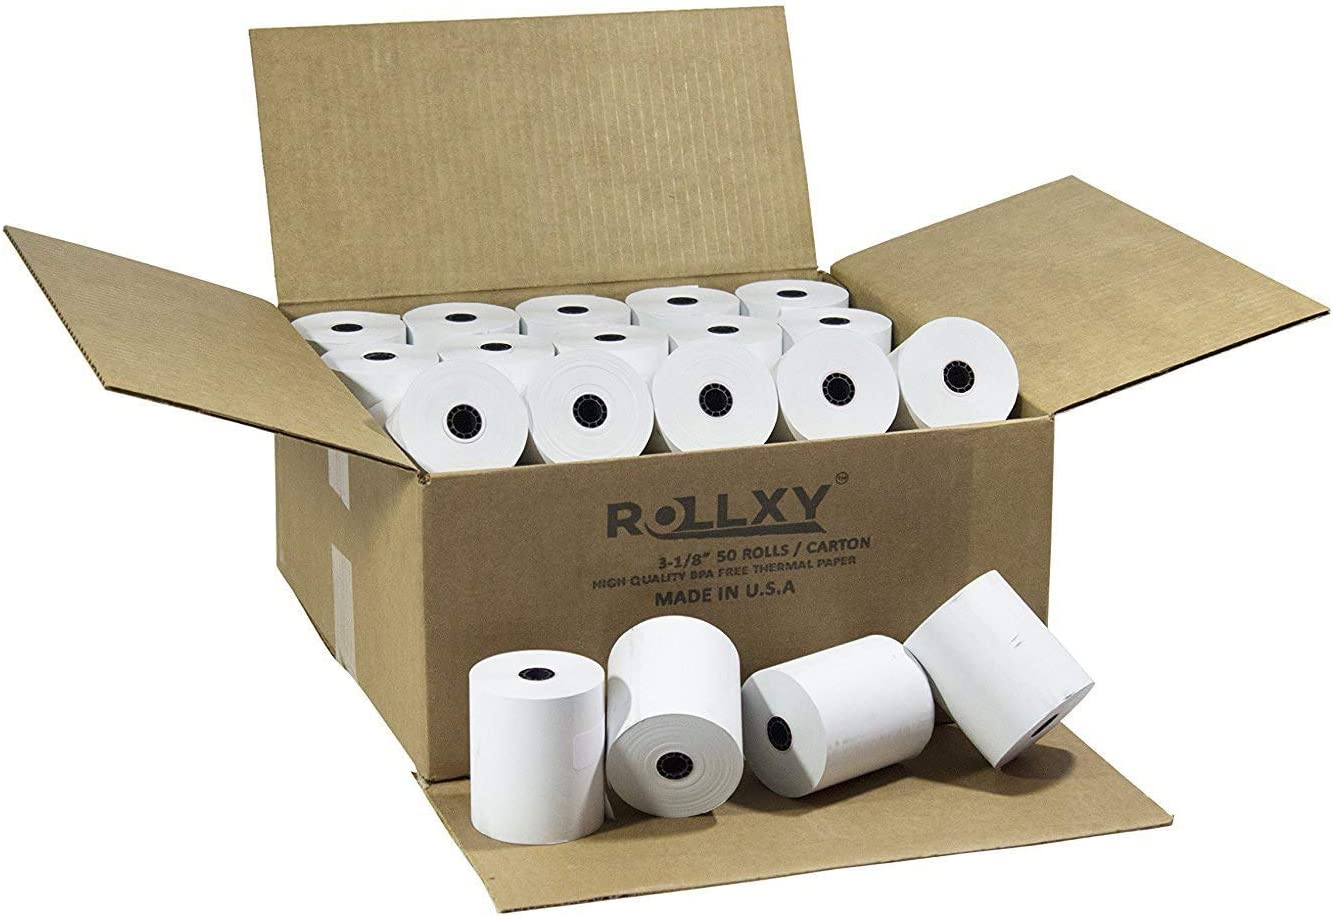 thermal paper roll 3 1 8 x 230 25 rolls TM-T88 T-20 T-90 Bixolon SRP-350 370 BPA Free Made in USA From RegisterRoll